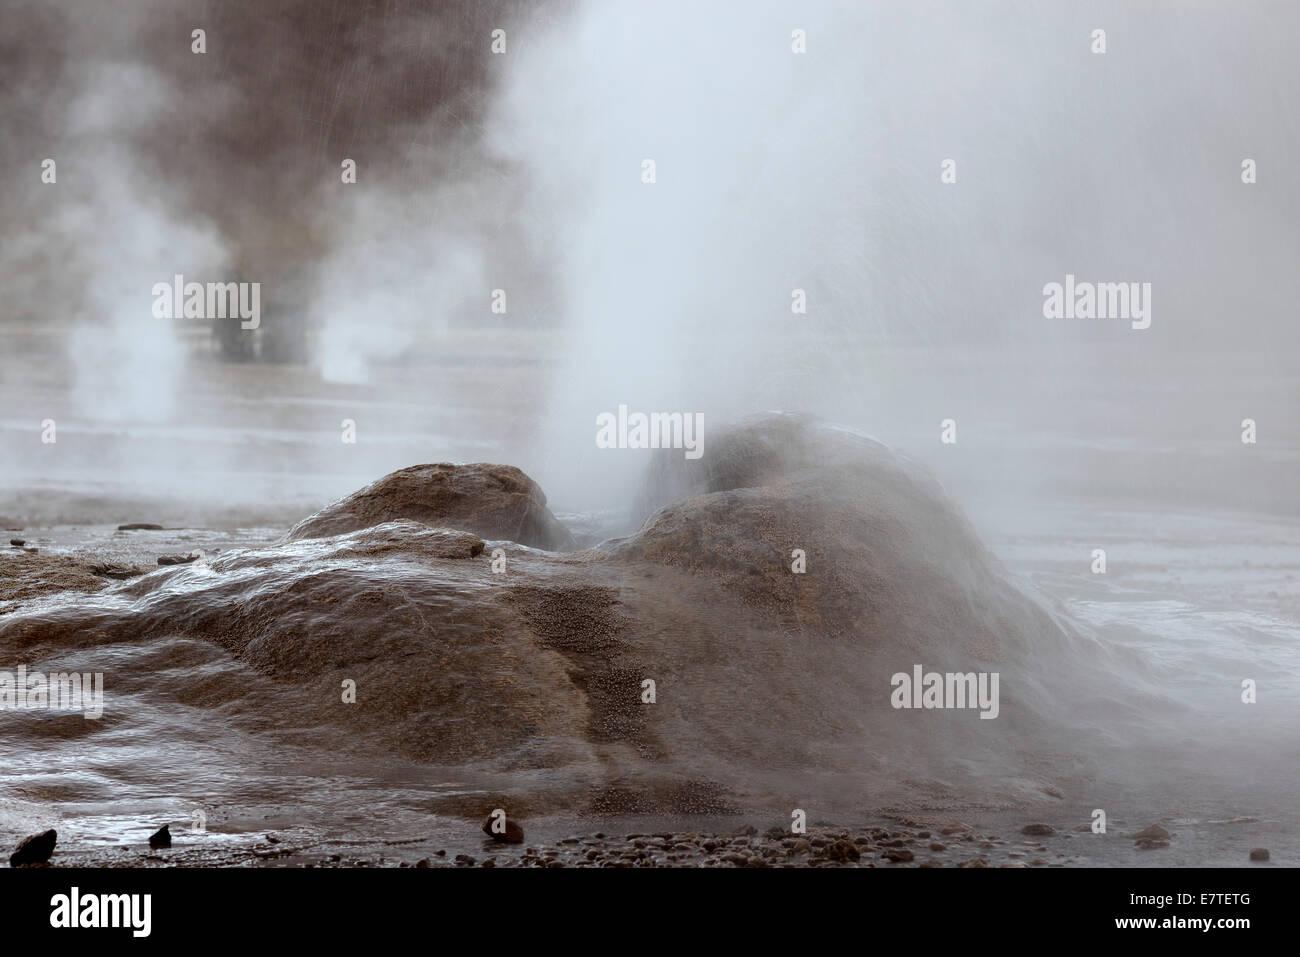 Geyser, vent releasing steam, El Tatio, the highest geyser field in the world, Antofagasta, on the edge of the Atacama - Stock Image